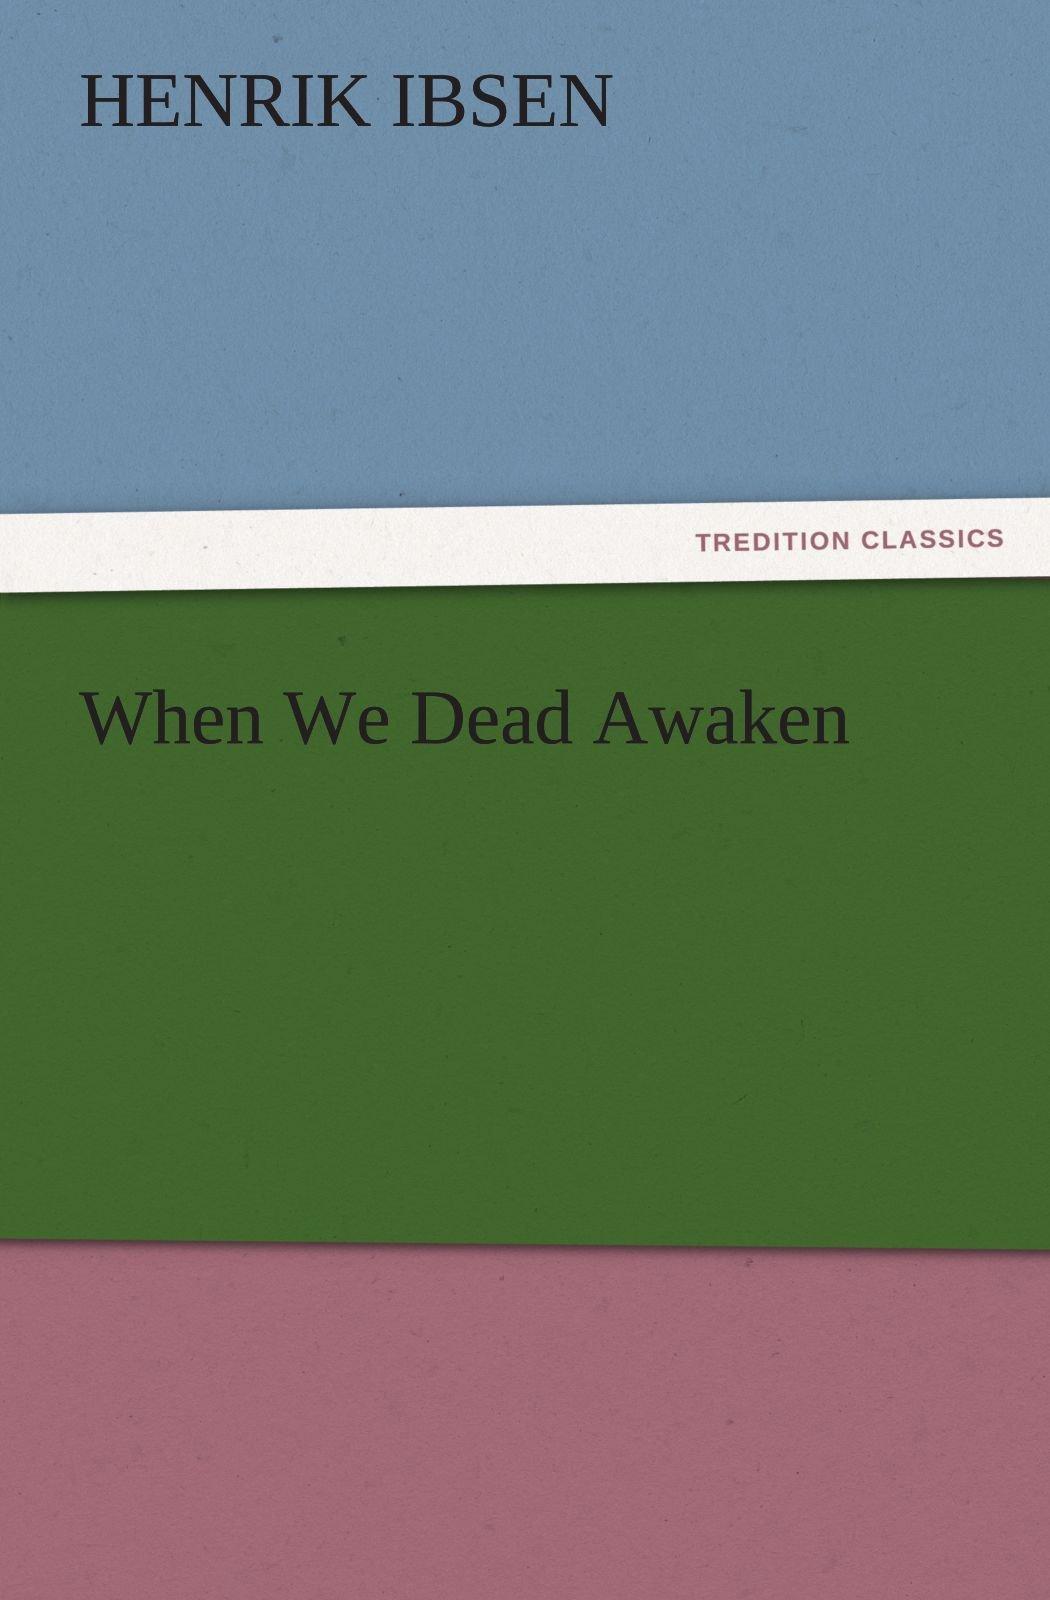 When We Dead Awaken (TREDITION CLASSICS) ebook